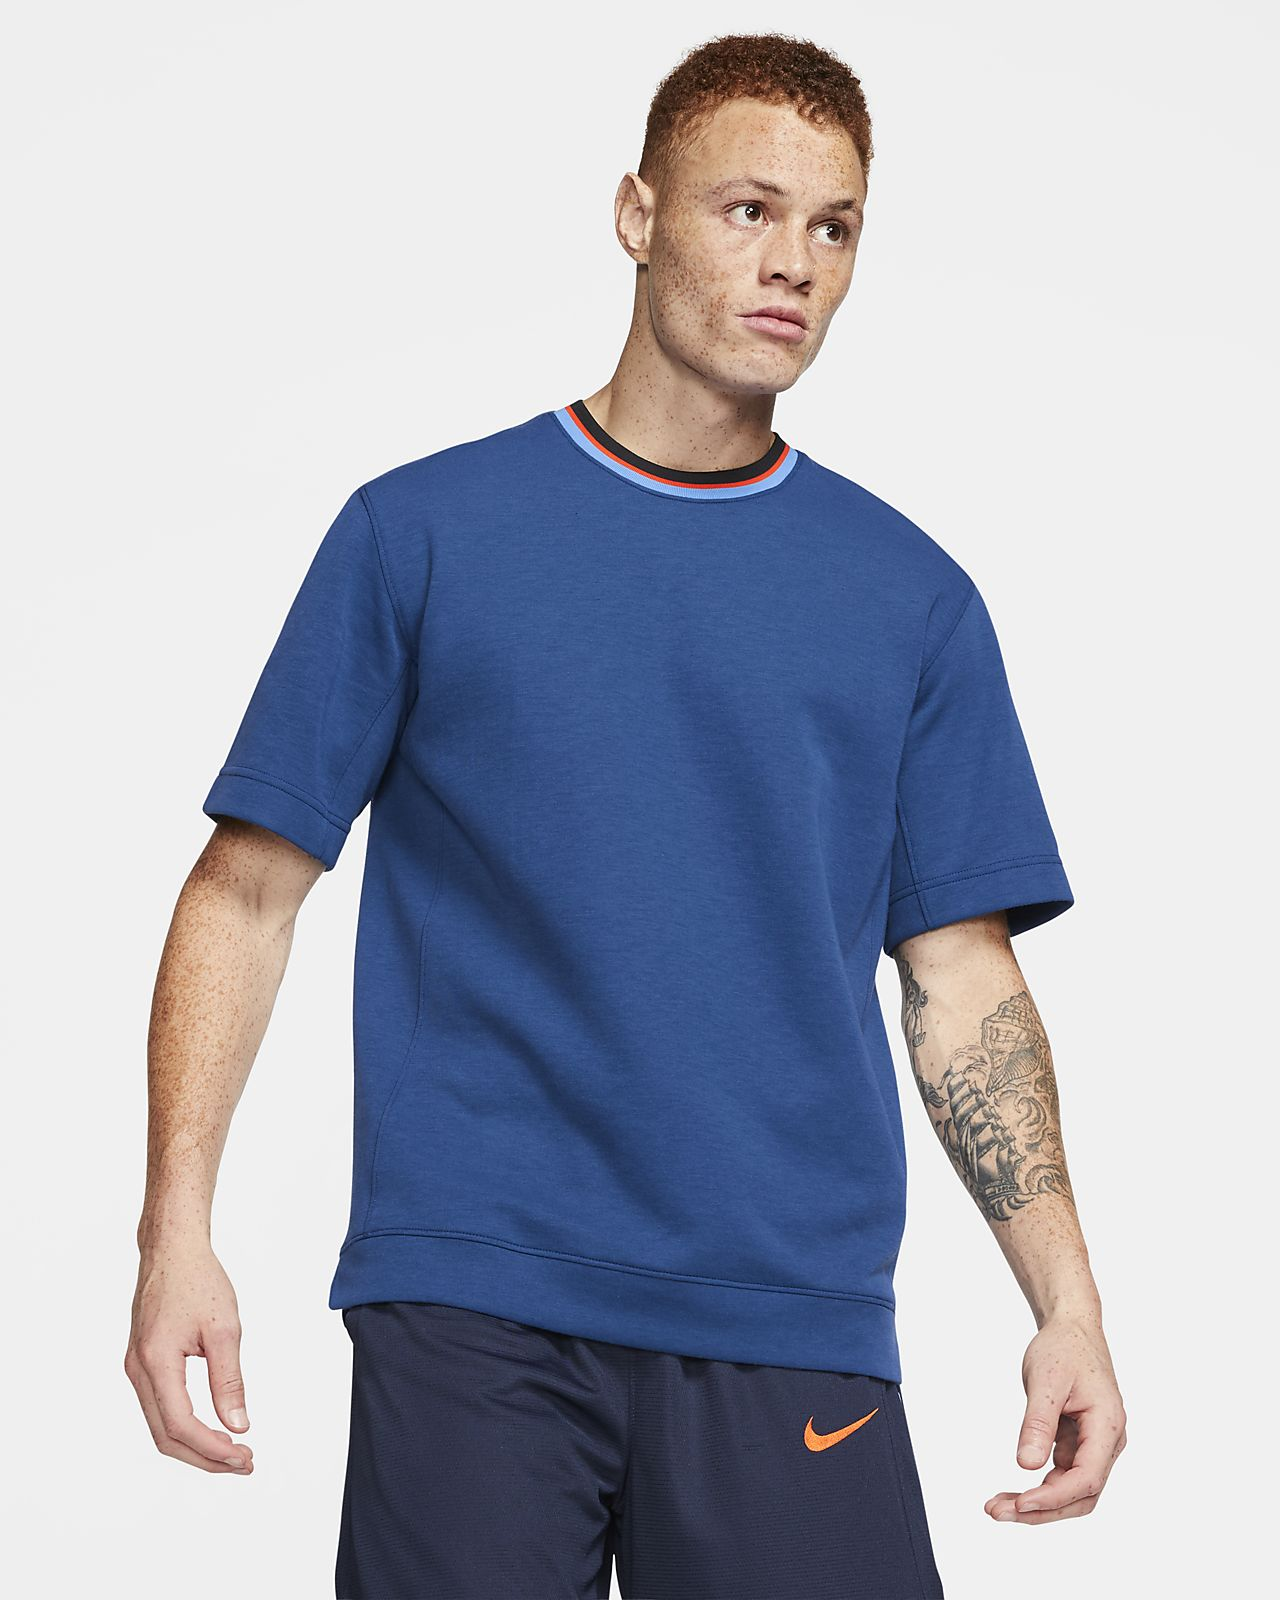 Camisola de basquetebol de manga curta Nike Dri-FIT para homem